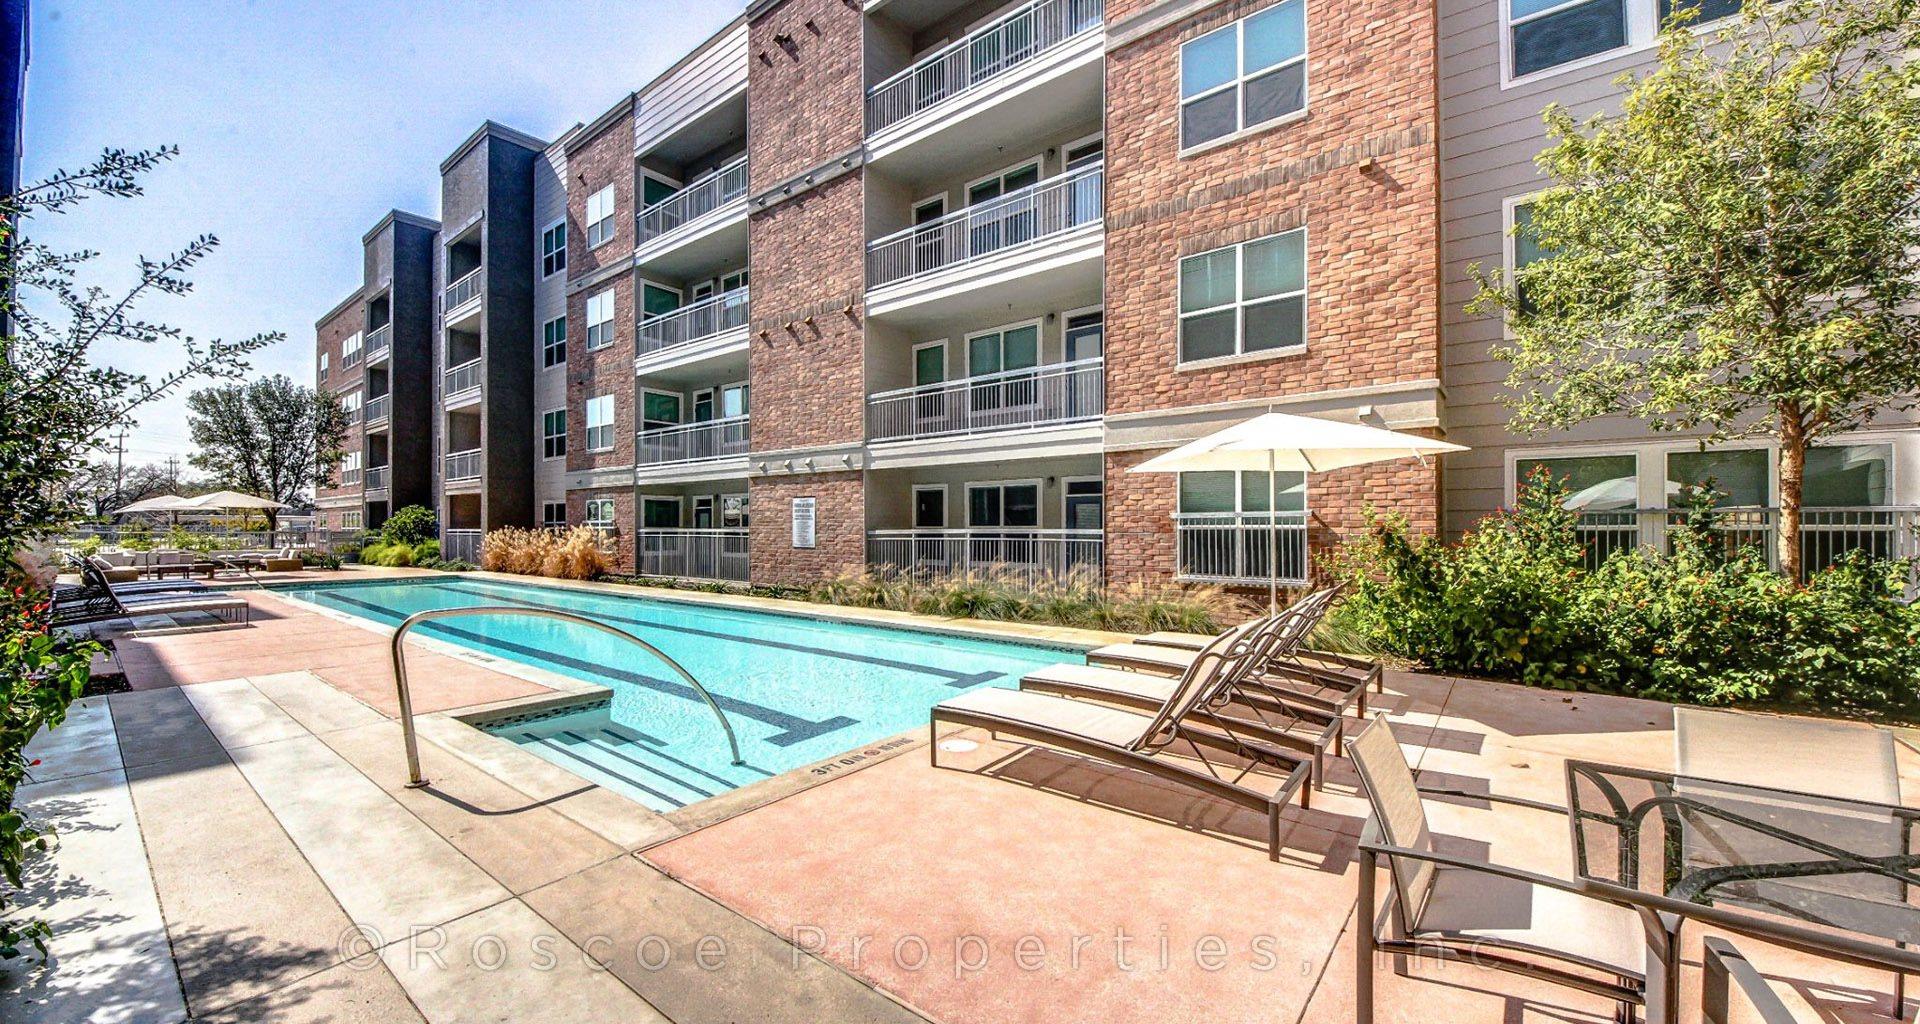 1111 Austin Highway Apartments in San Antonio pool